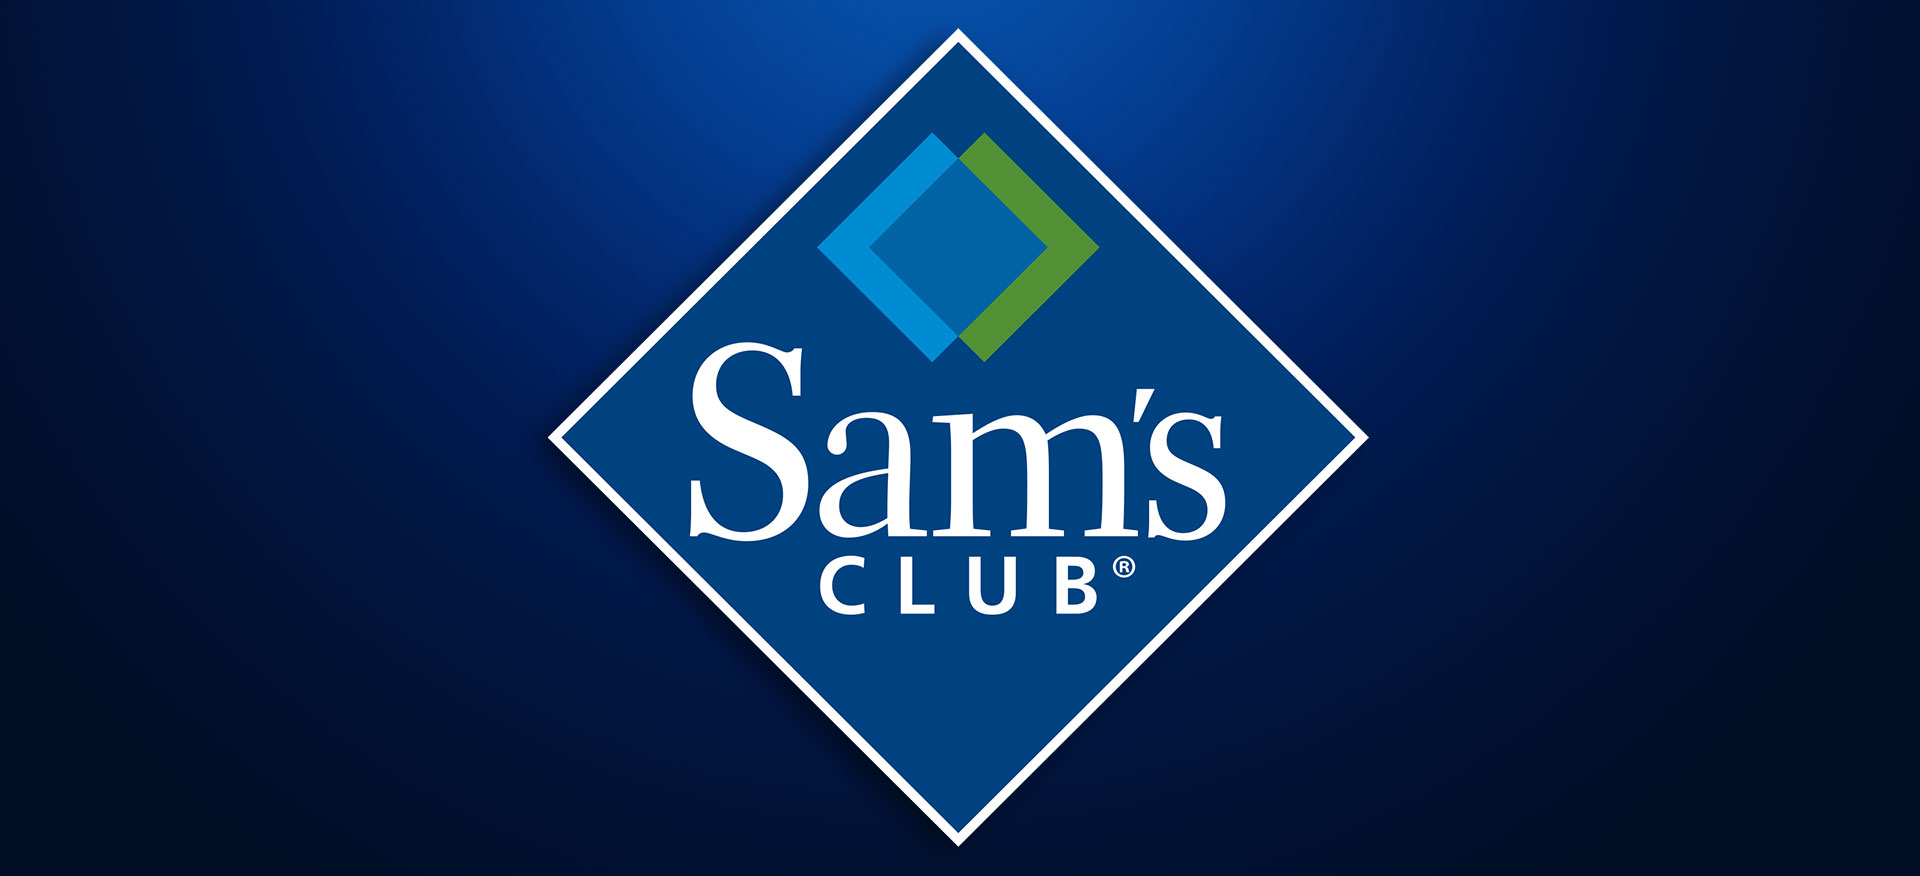 Sams Club Logos